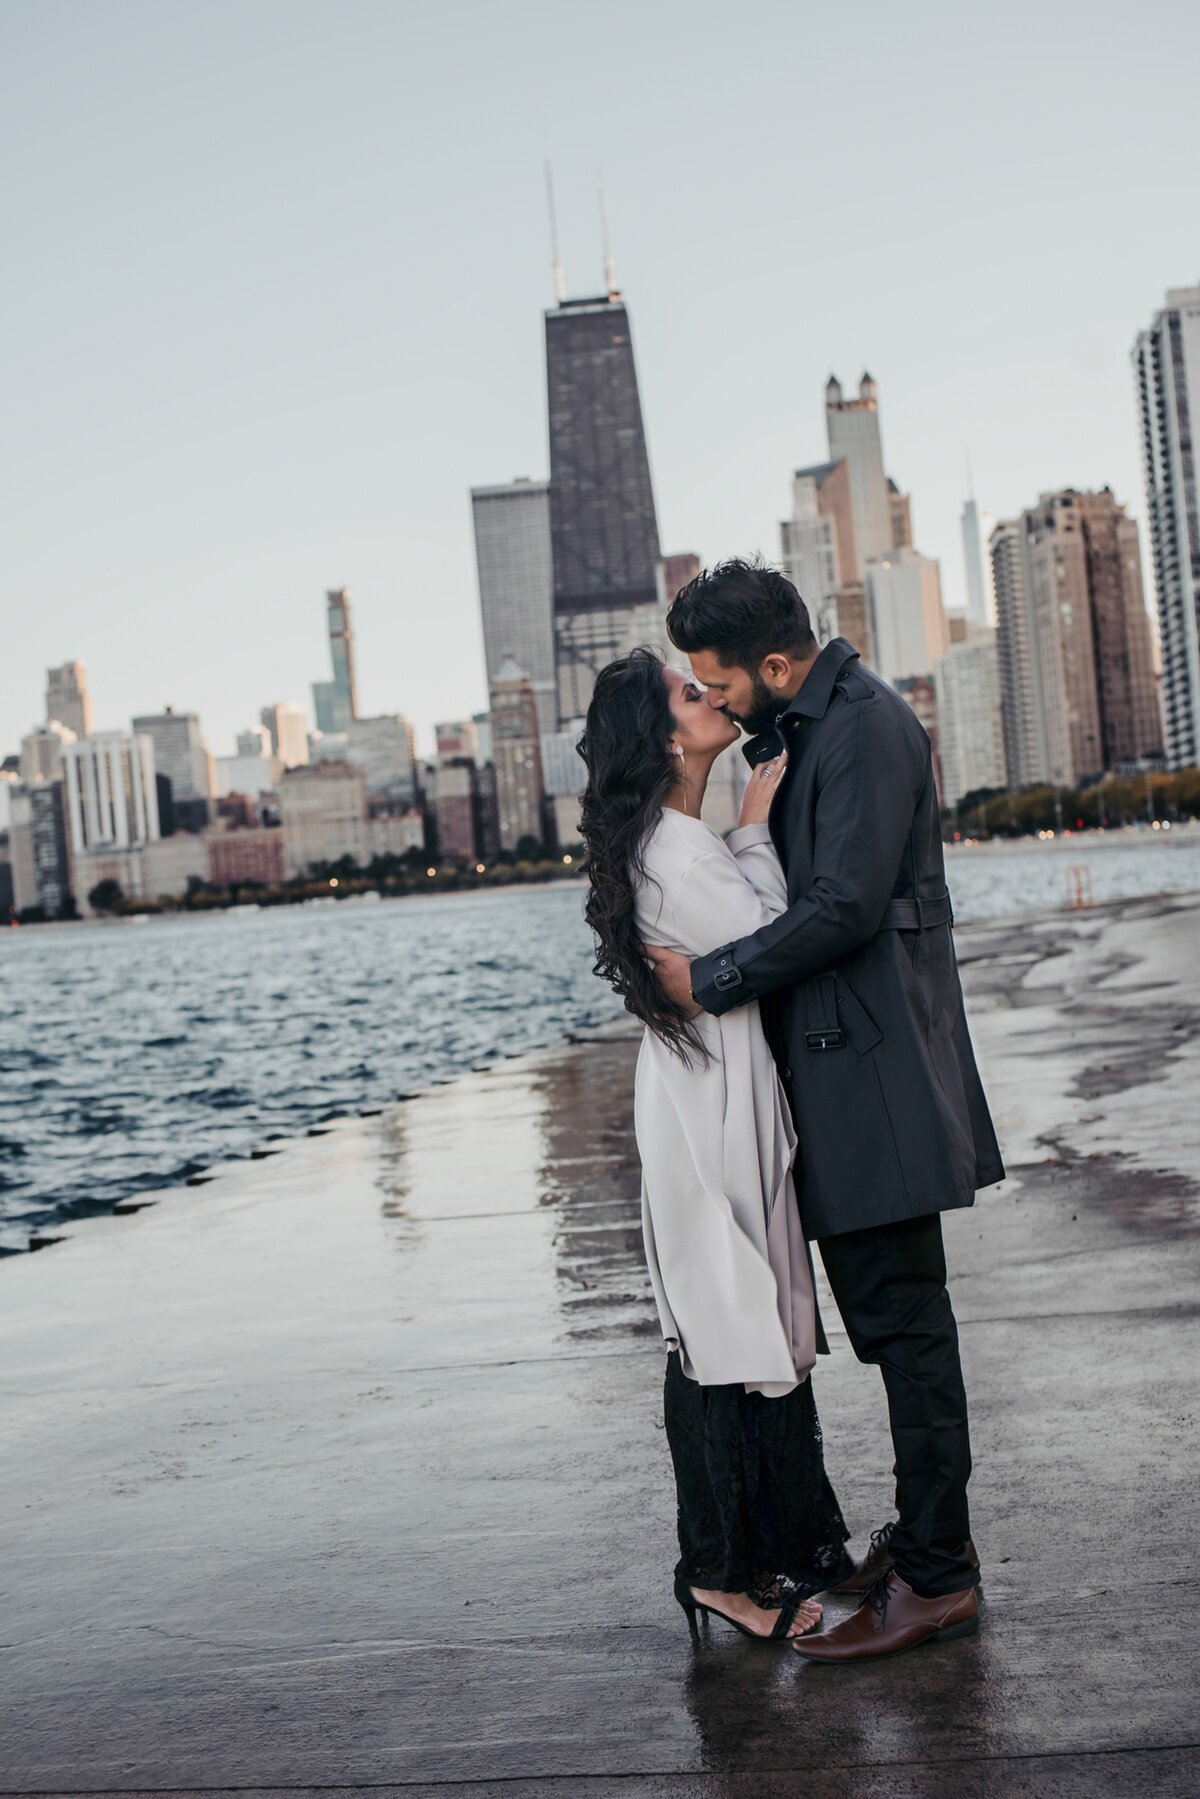 Le Cape Weddings - Chicago Engagement Session - Joann and Bensen -20.jpg